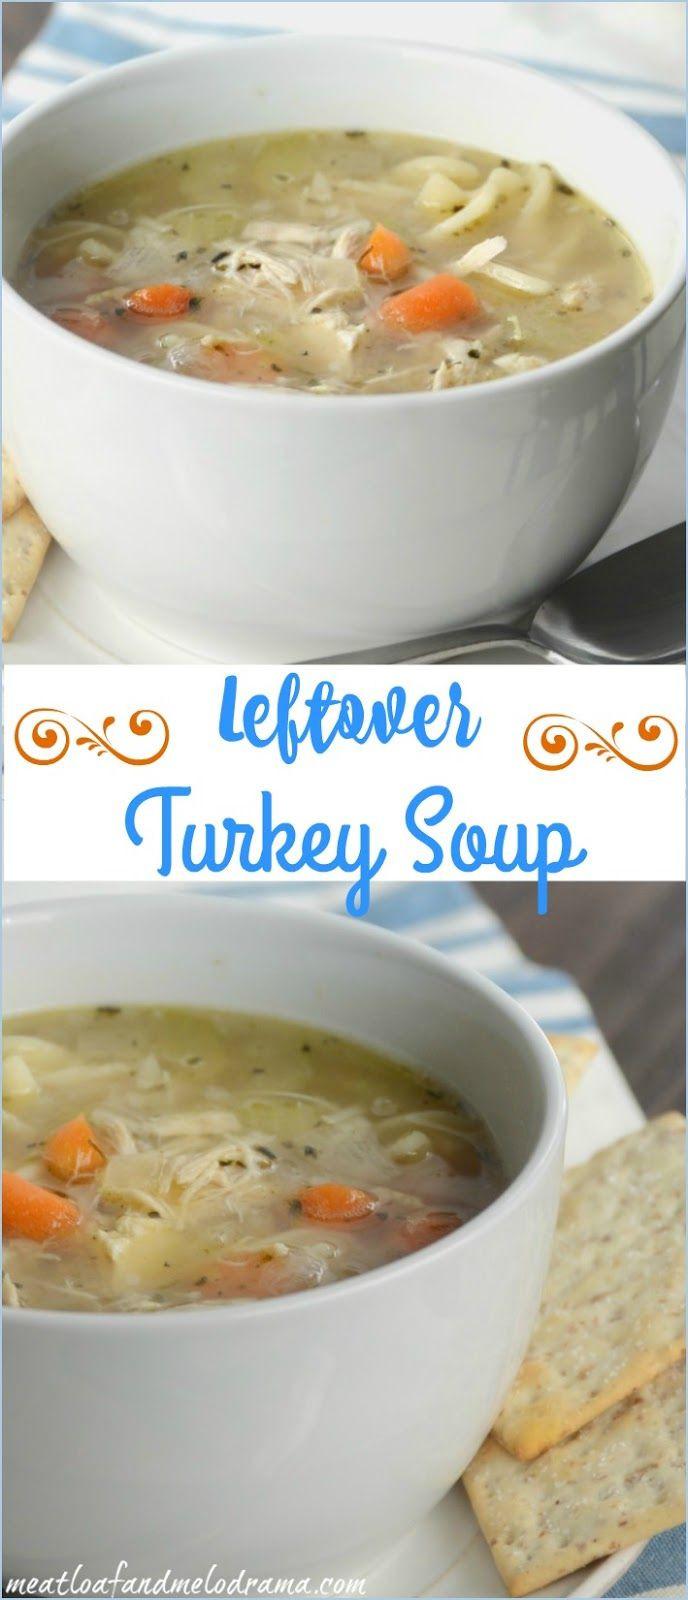 Turkey Soup From Leftover  Best 25 Turkey soup ideas on Pinterest